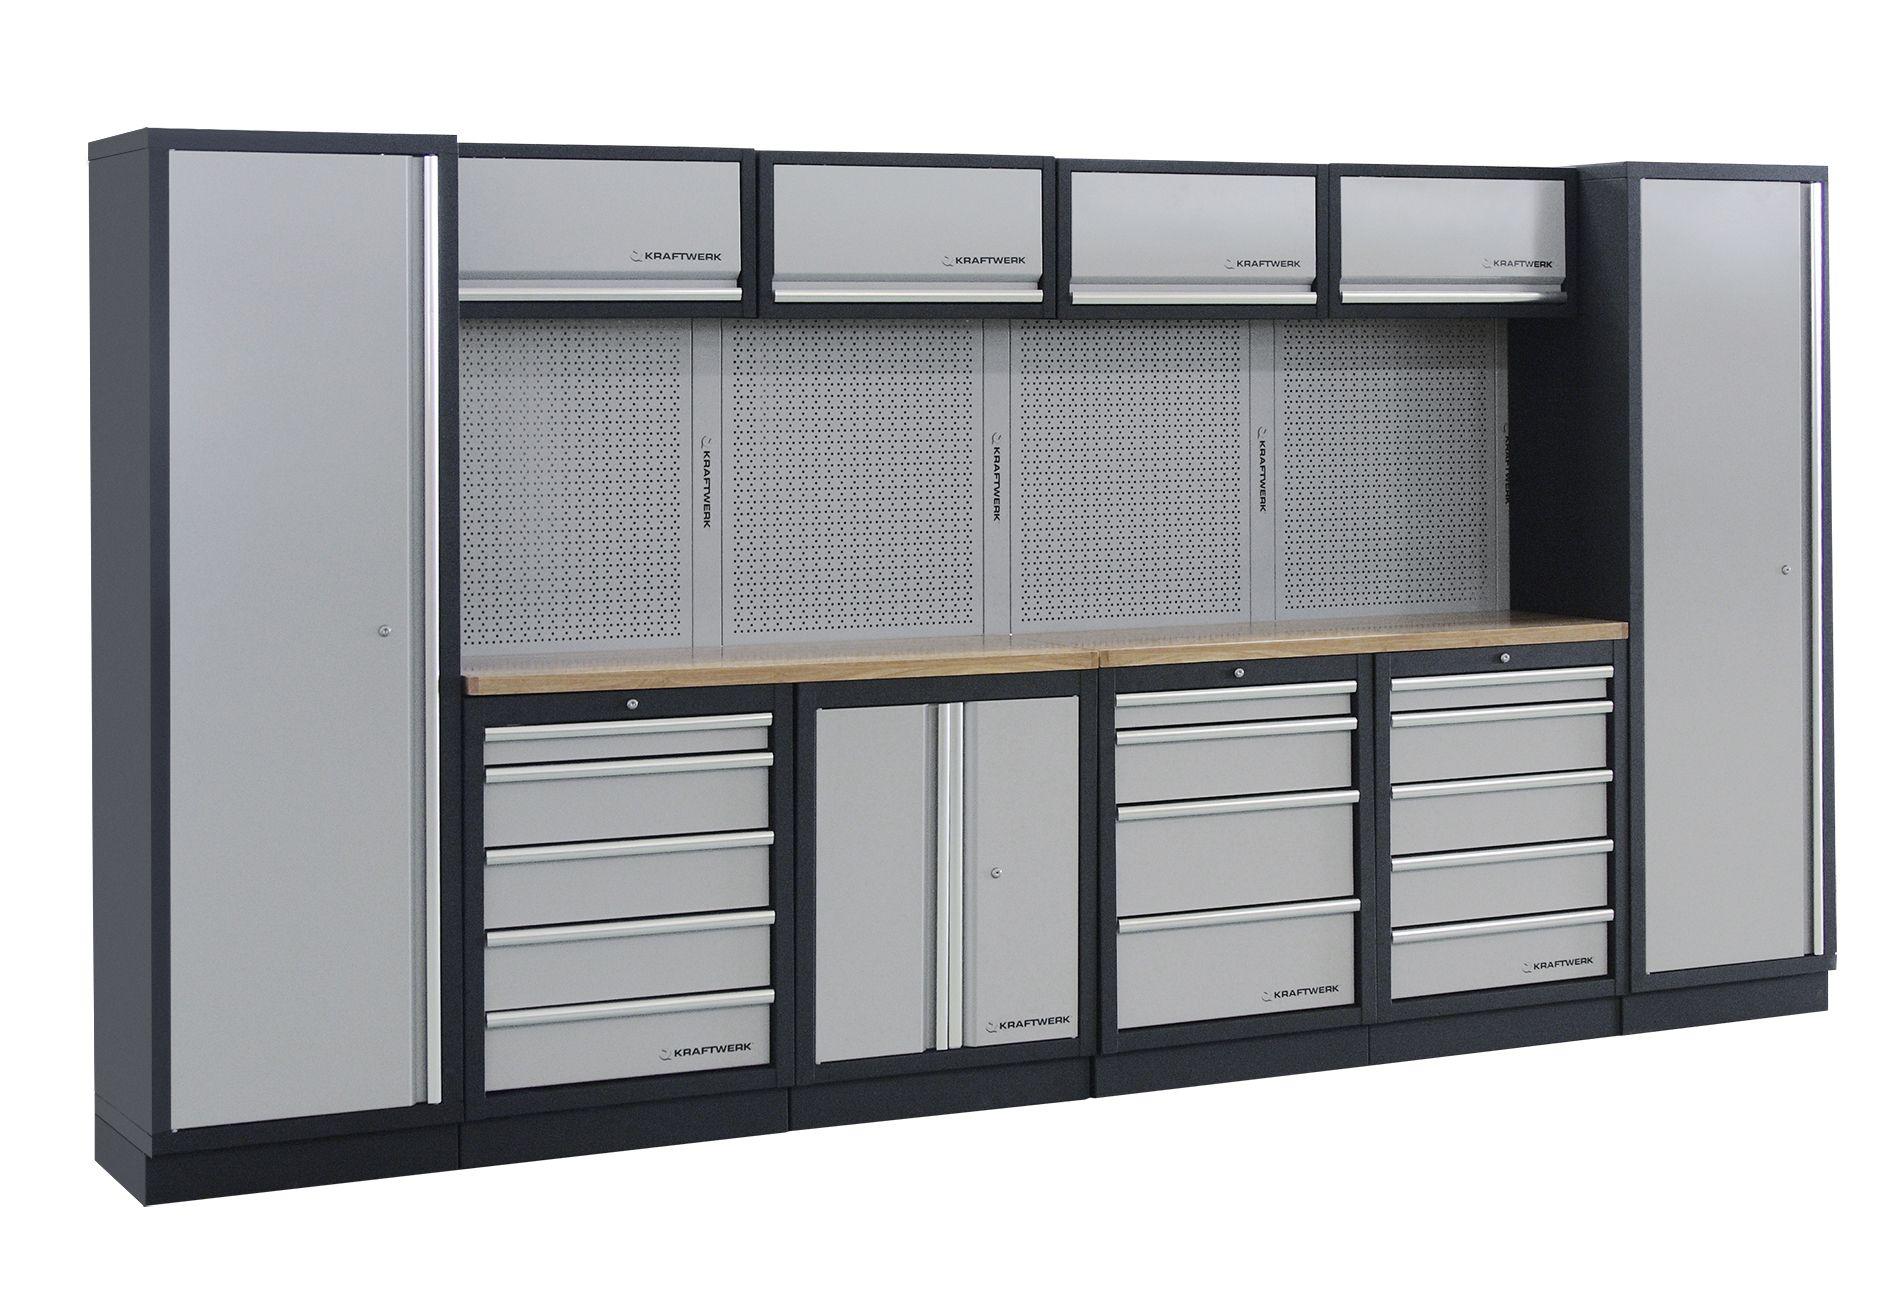 Mobilier D Atelier De Scrap Mobilier D Atelier Servante Charriot Meuble Rangement Meuble Rangement Pas Cher Armoire Rangement Garage